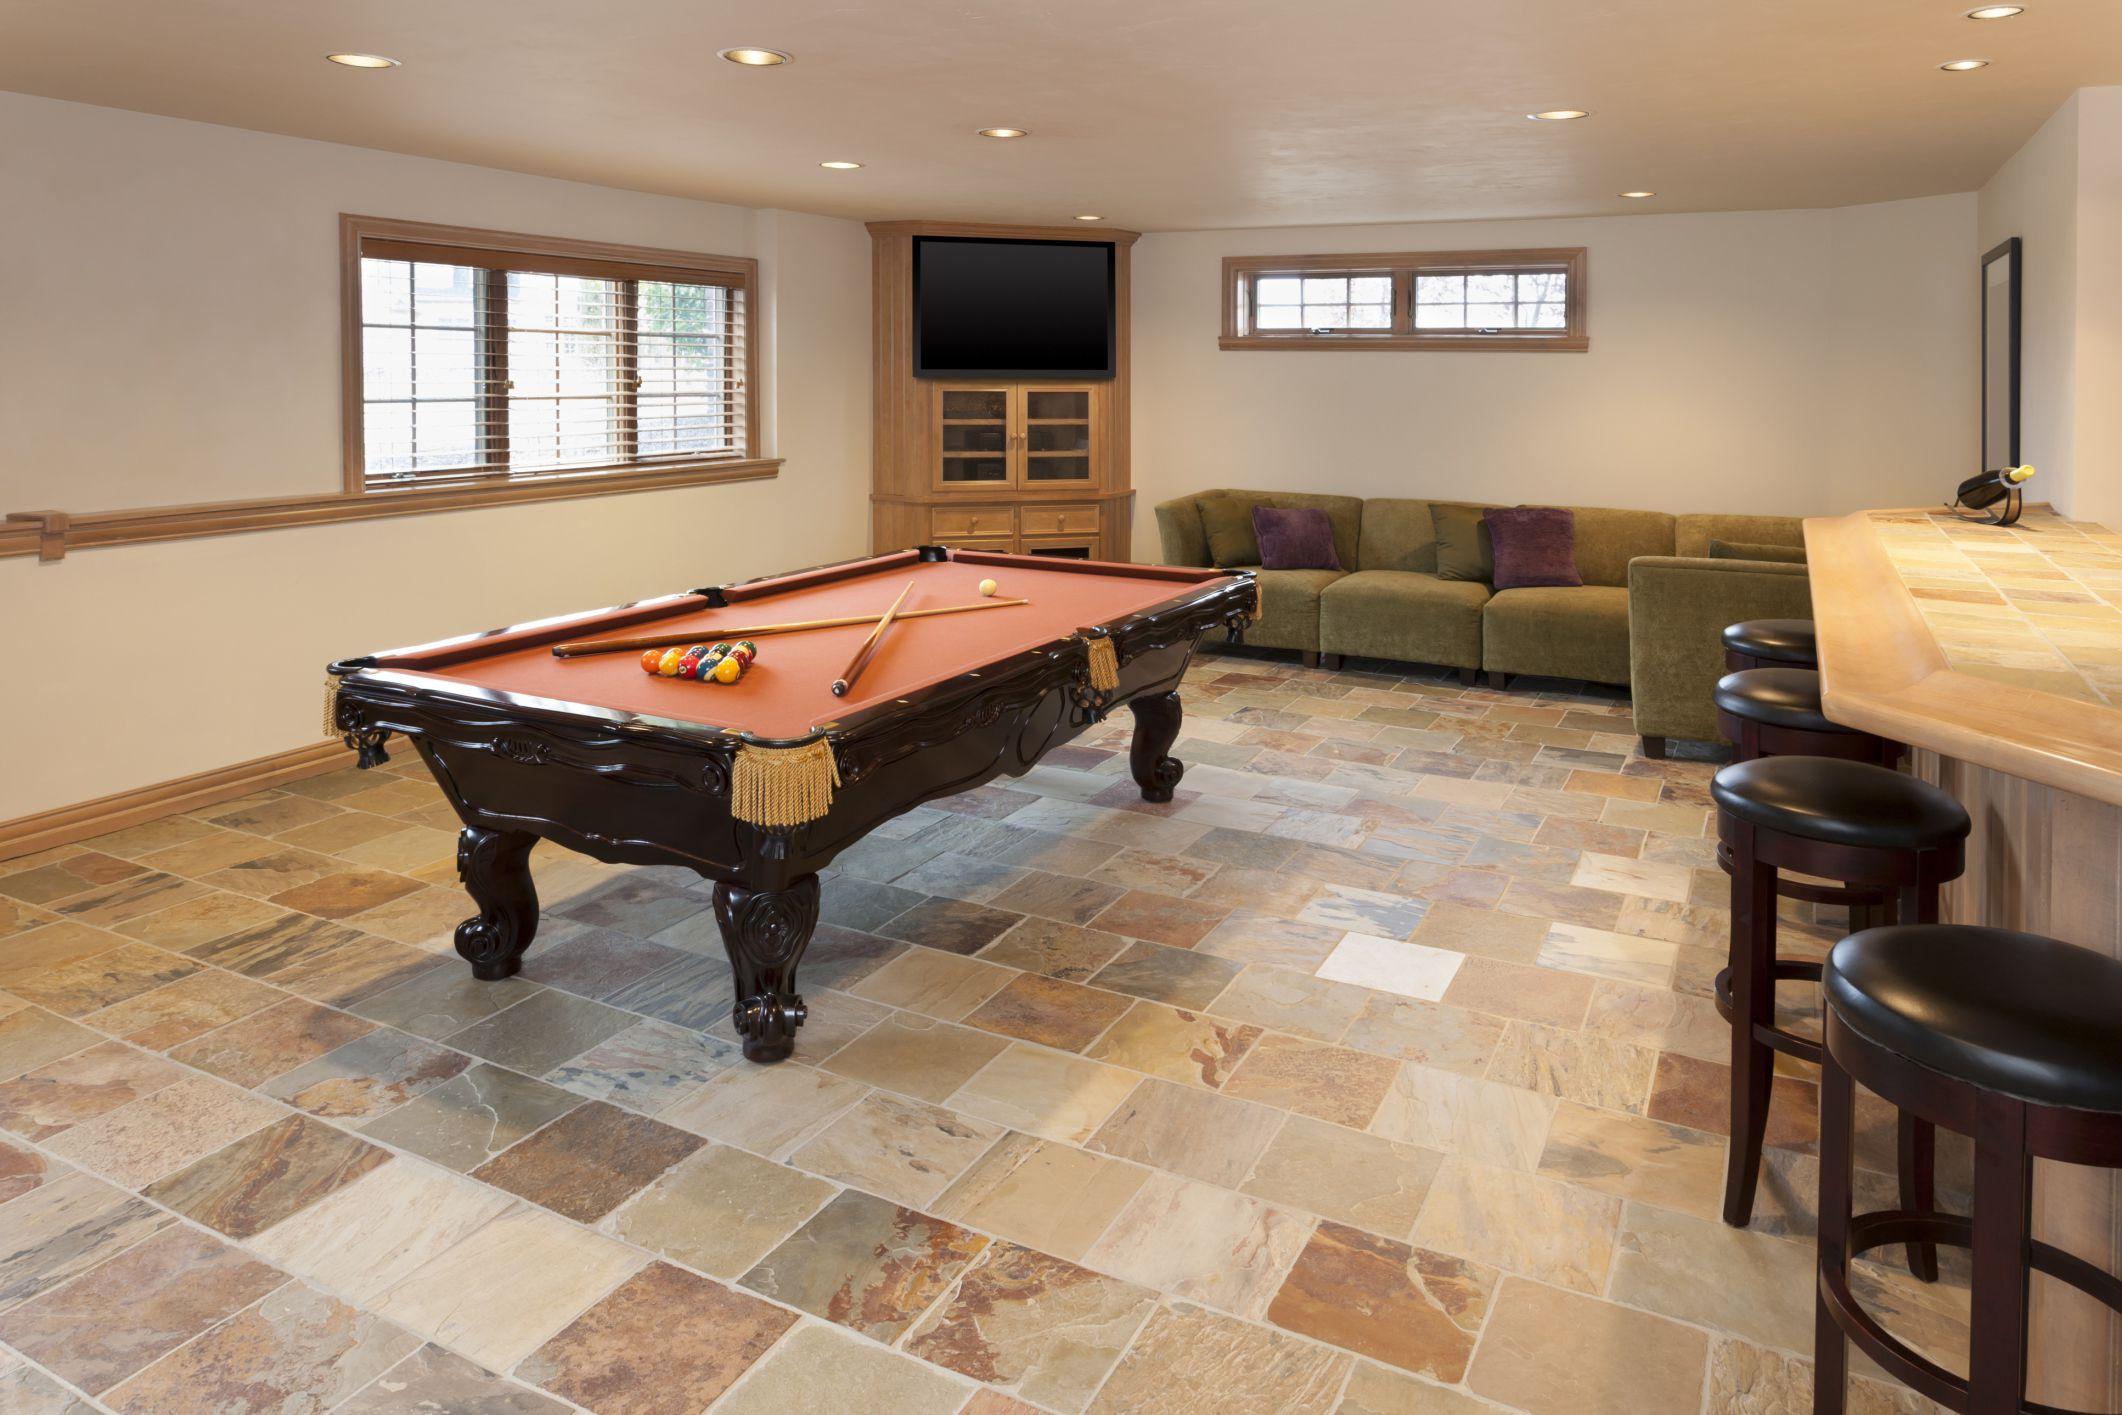 Basement flooring options for wet basements - Basement Flooring Options For Wet Basements 13